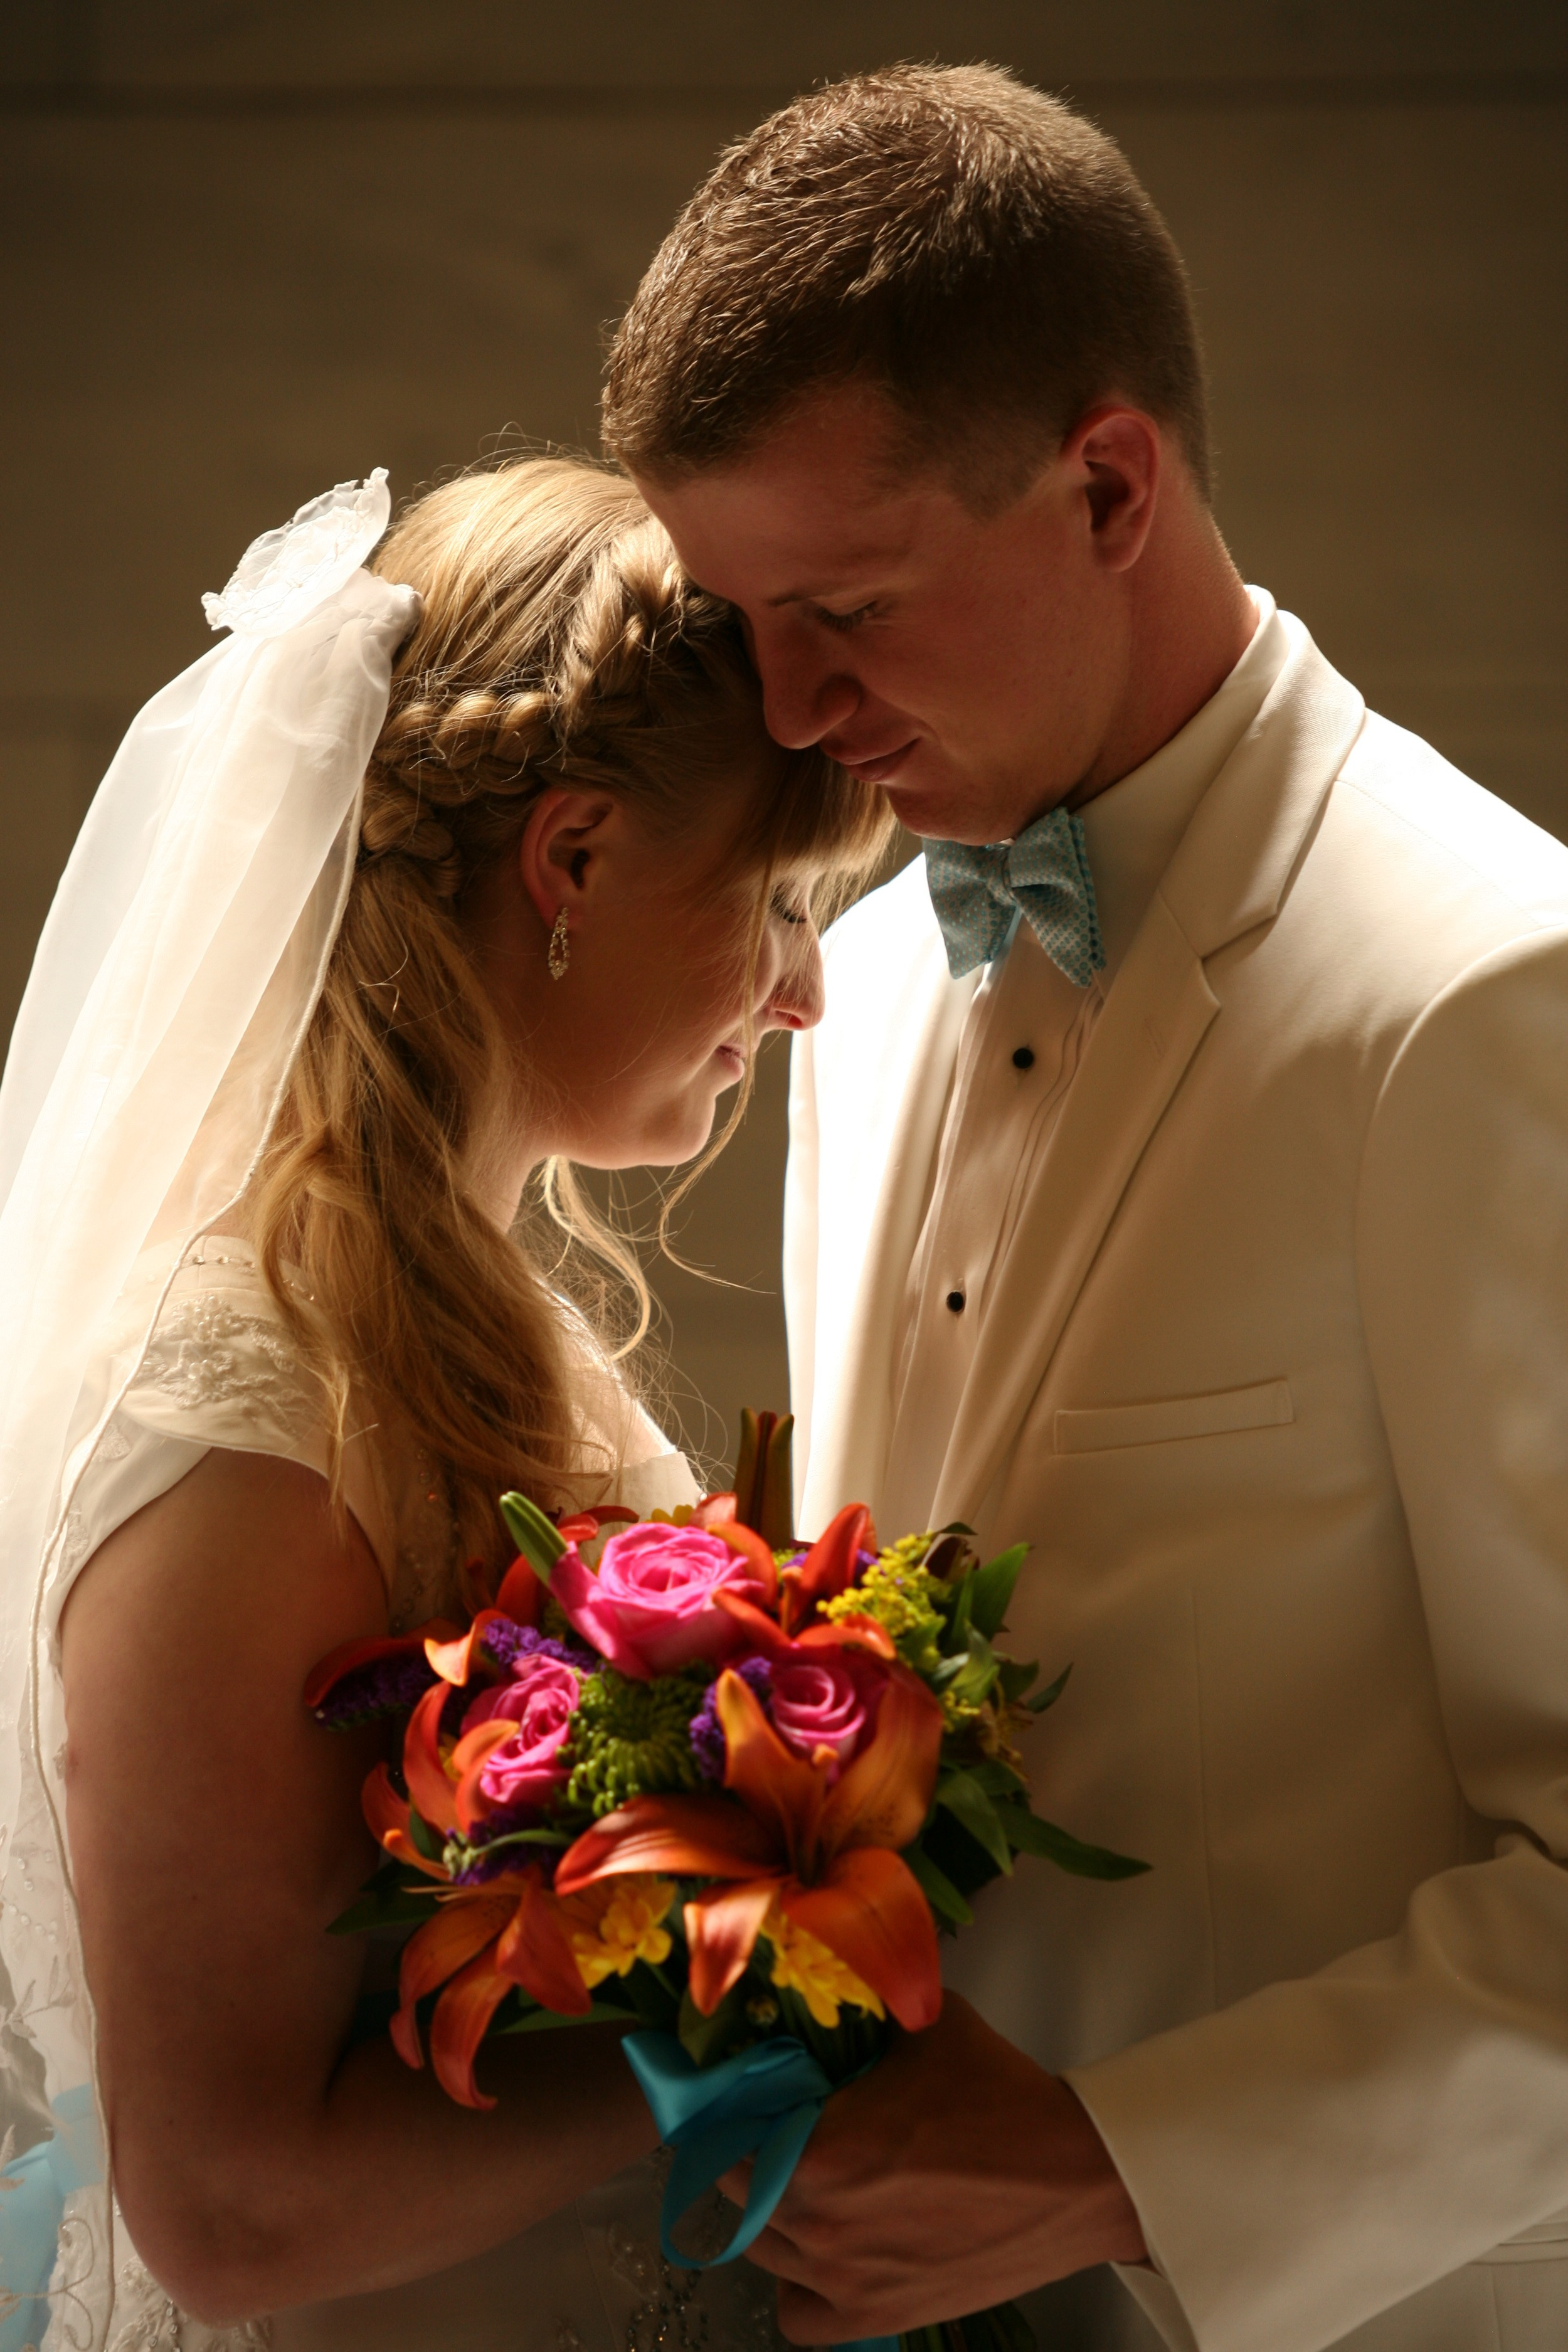 Salt Lake Bride and Groom photography